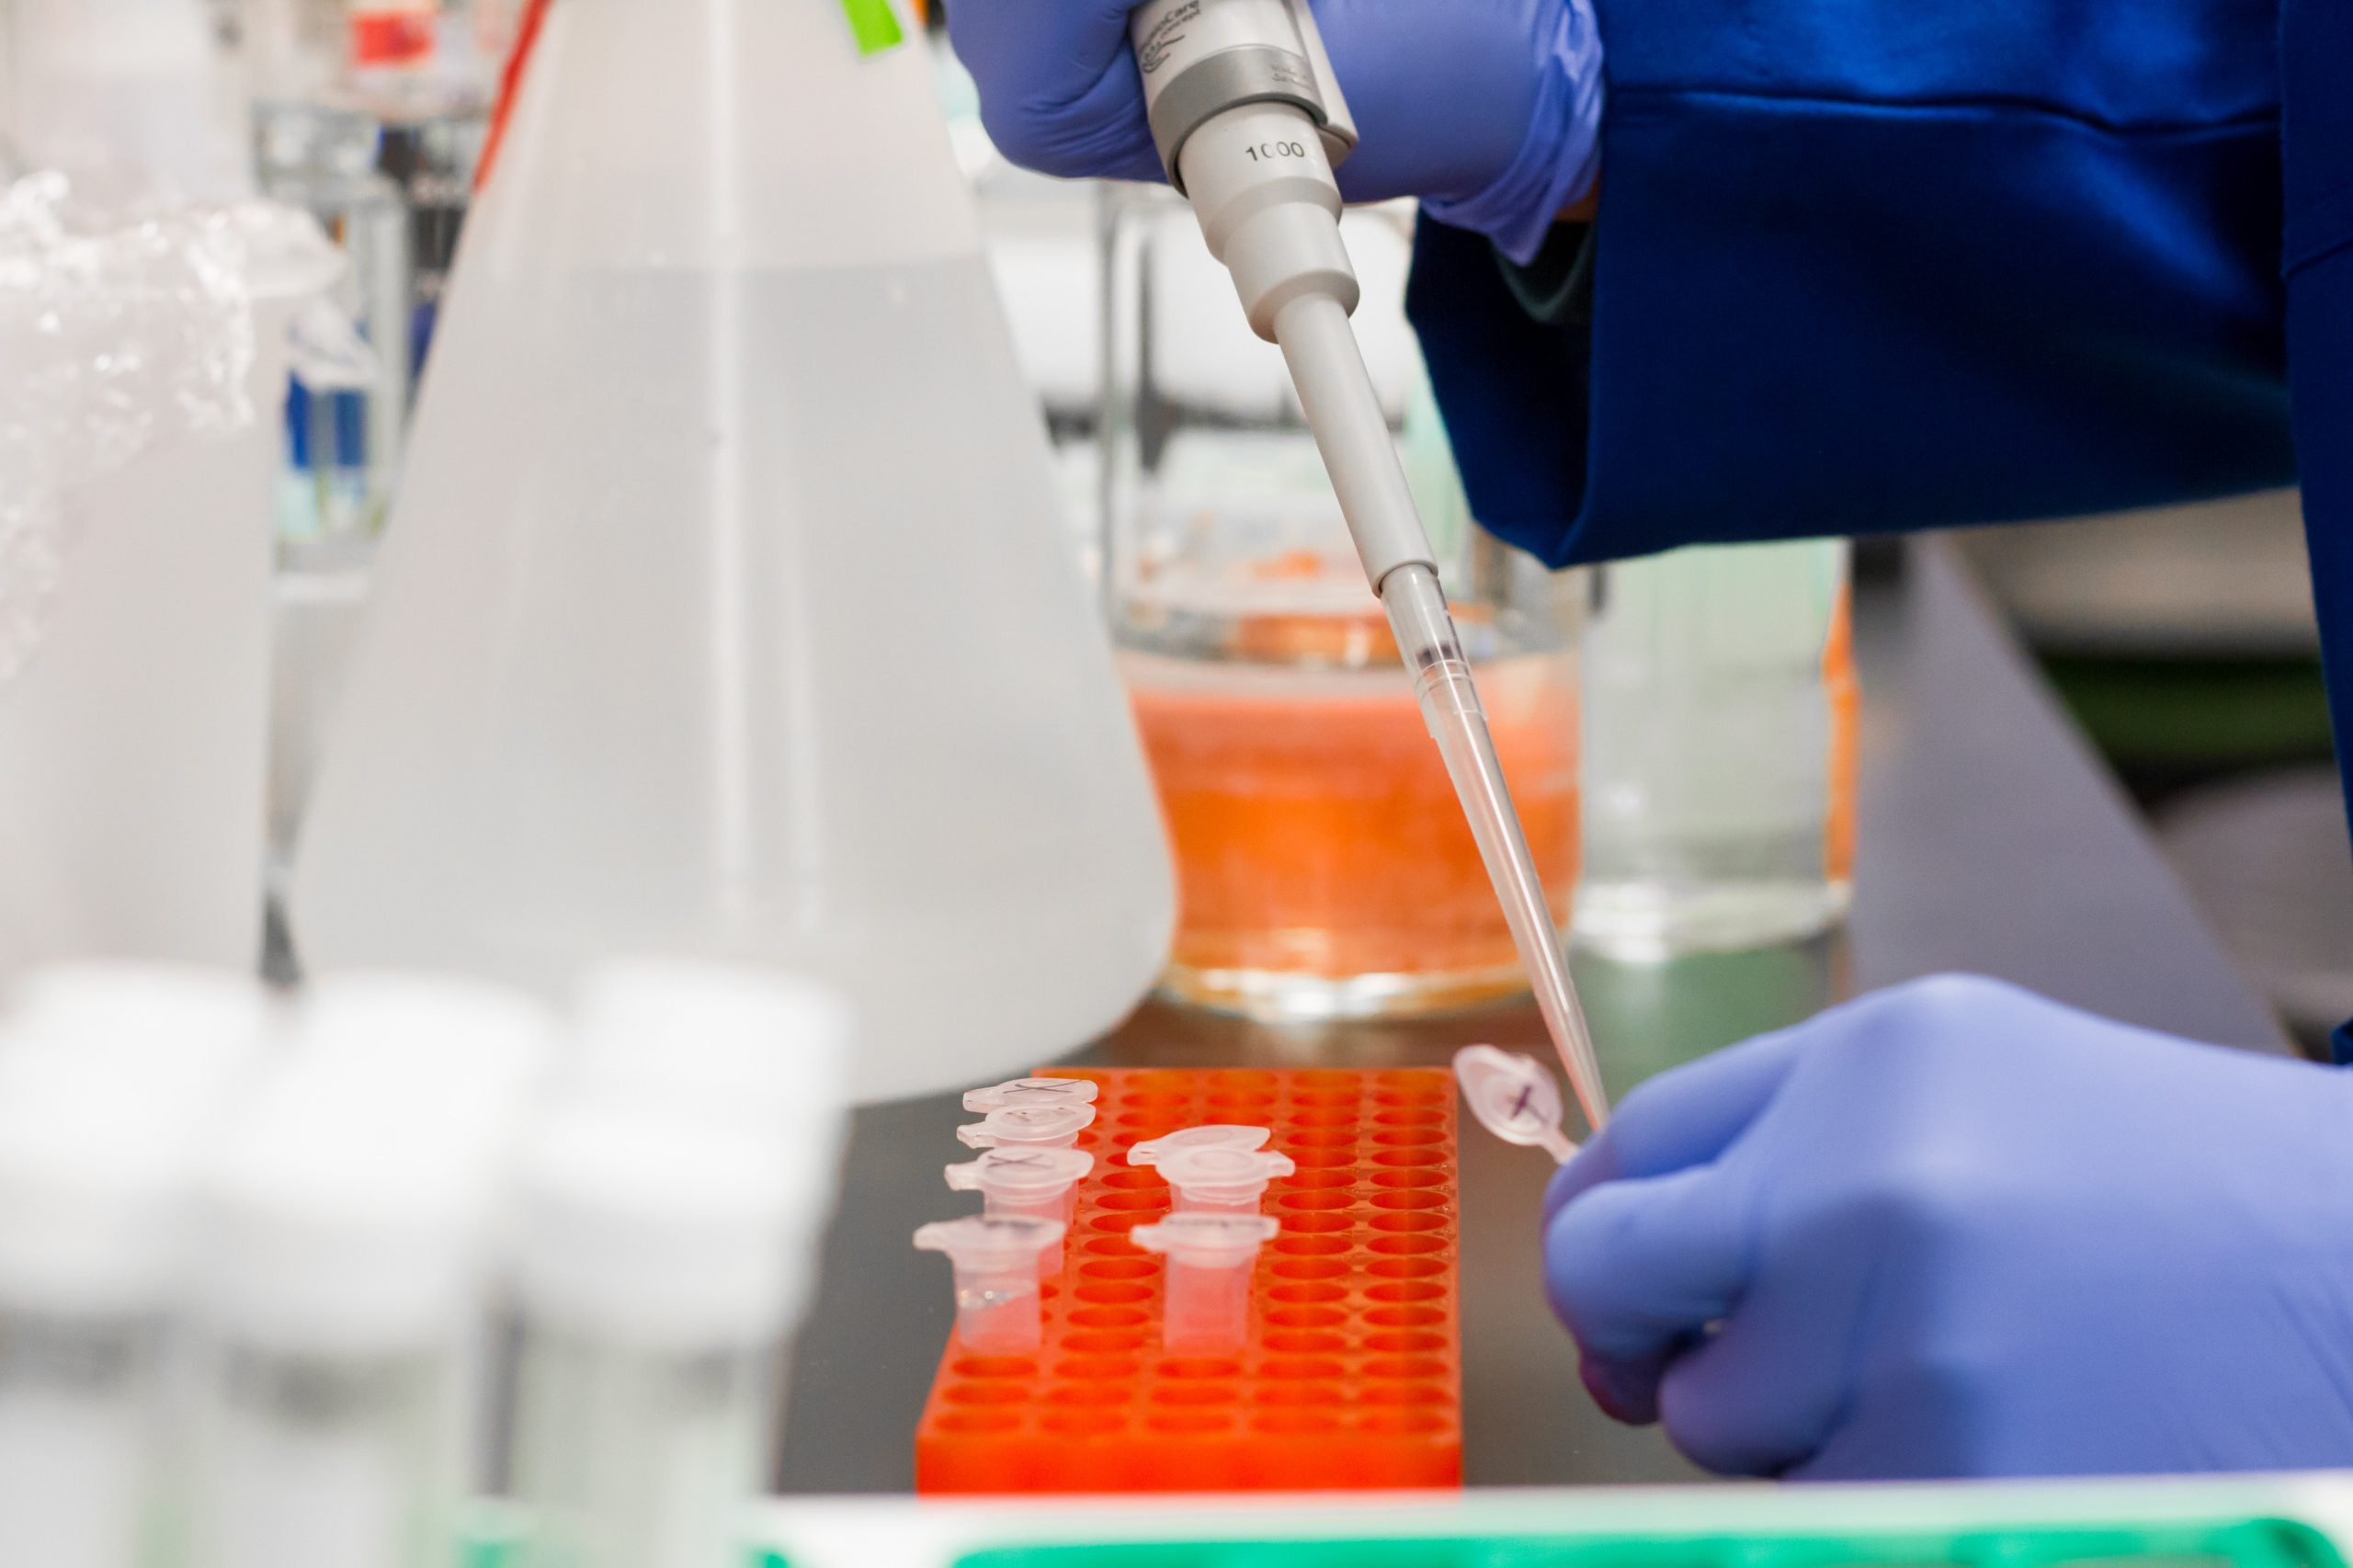 Институт ФМБА подал документы на регистрацию препарата от коронавируса «МИР 19»